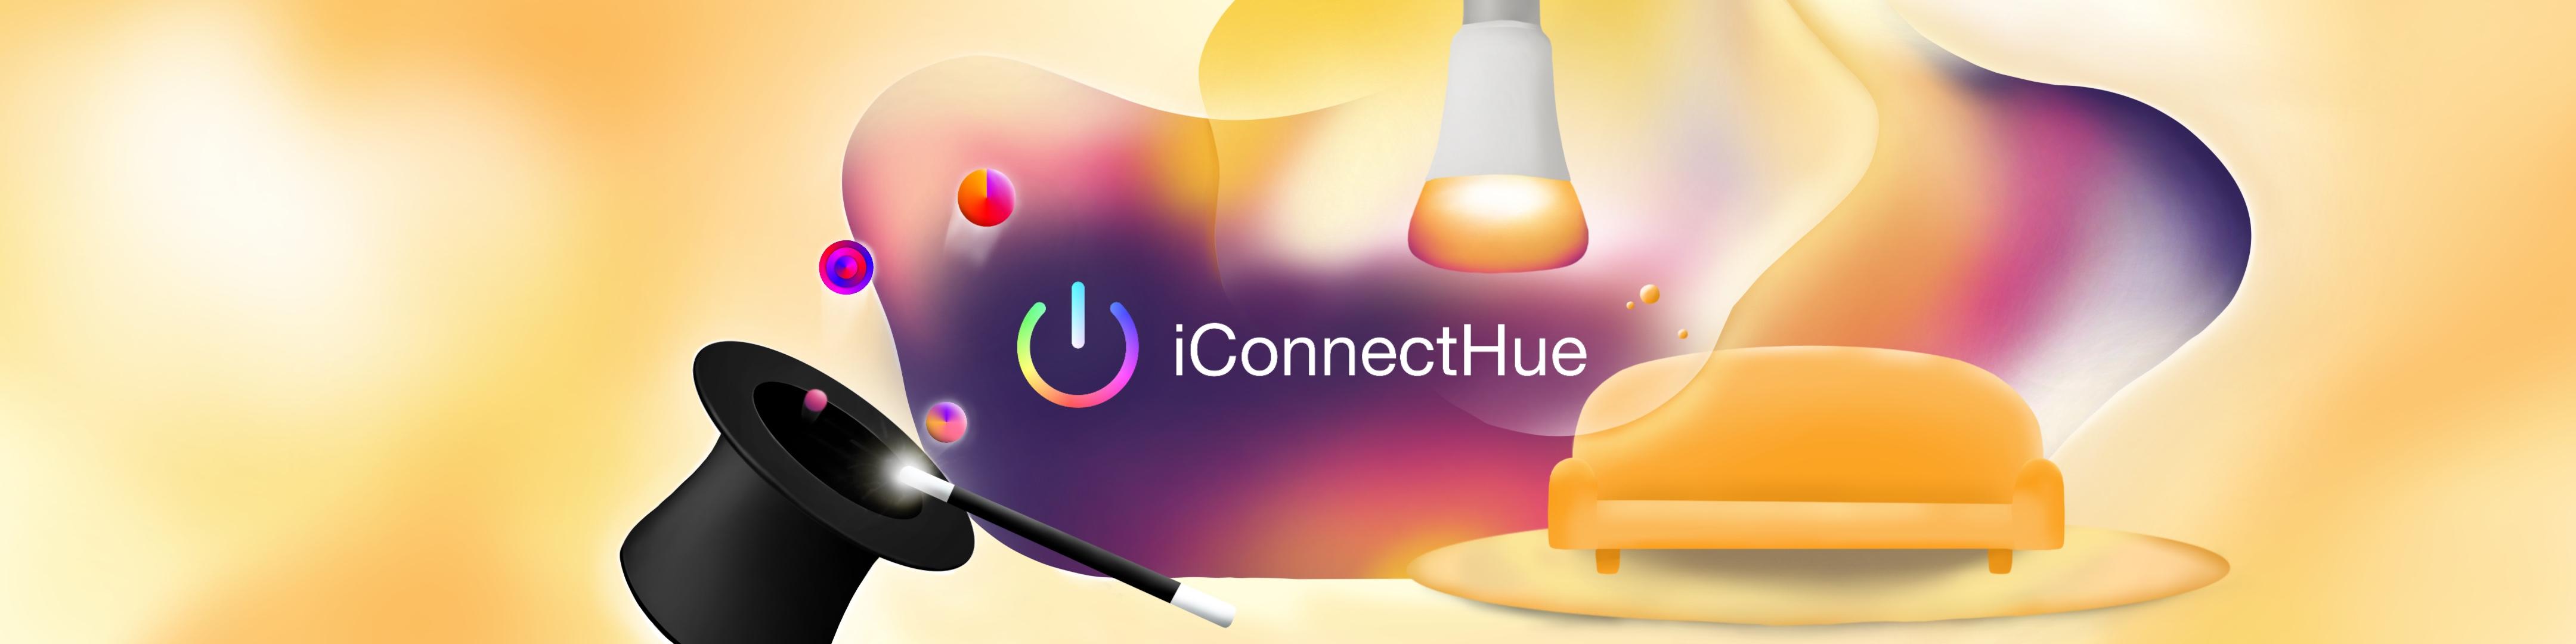 FAQ Help | iConnectHue